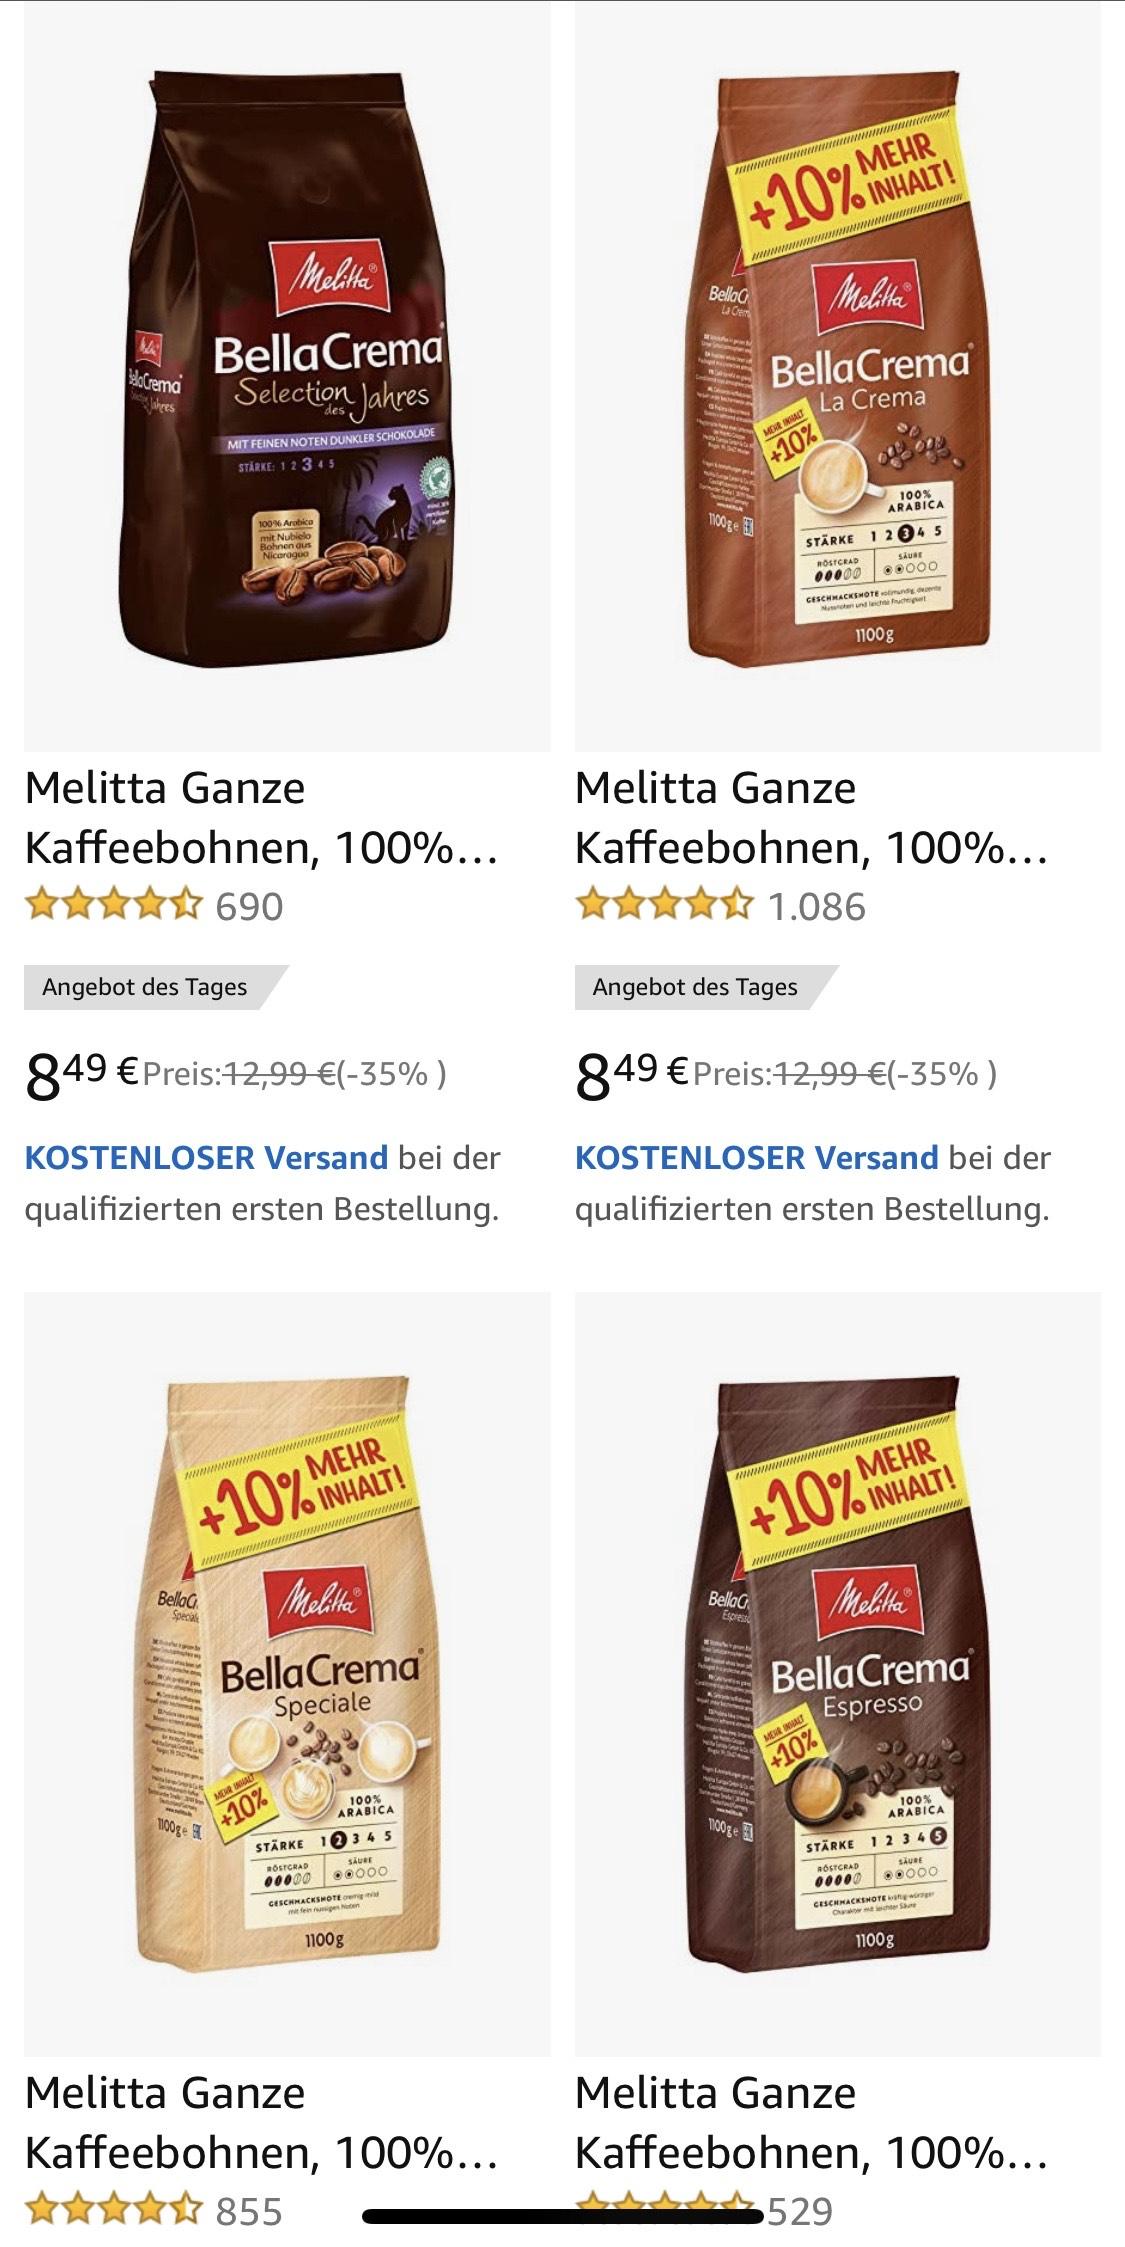 Melitta BellaCrema - ganze Kaffeebohnen - 1,1 kg (Amazon Tagesangebot)